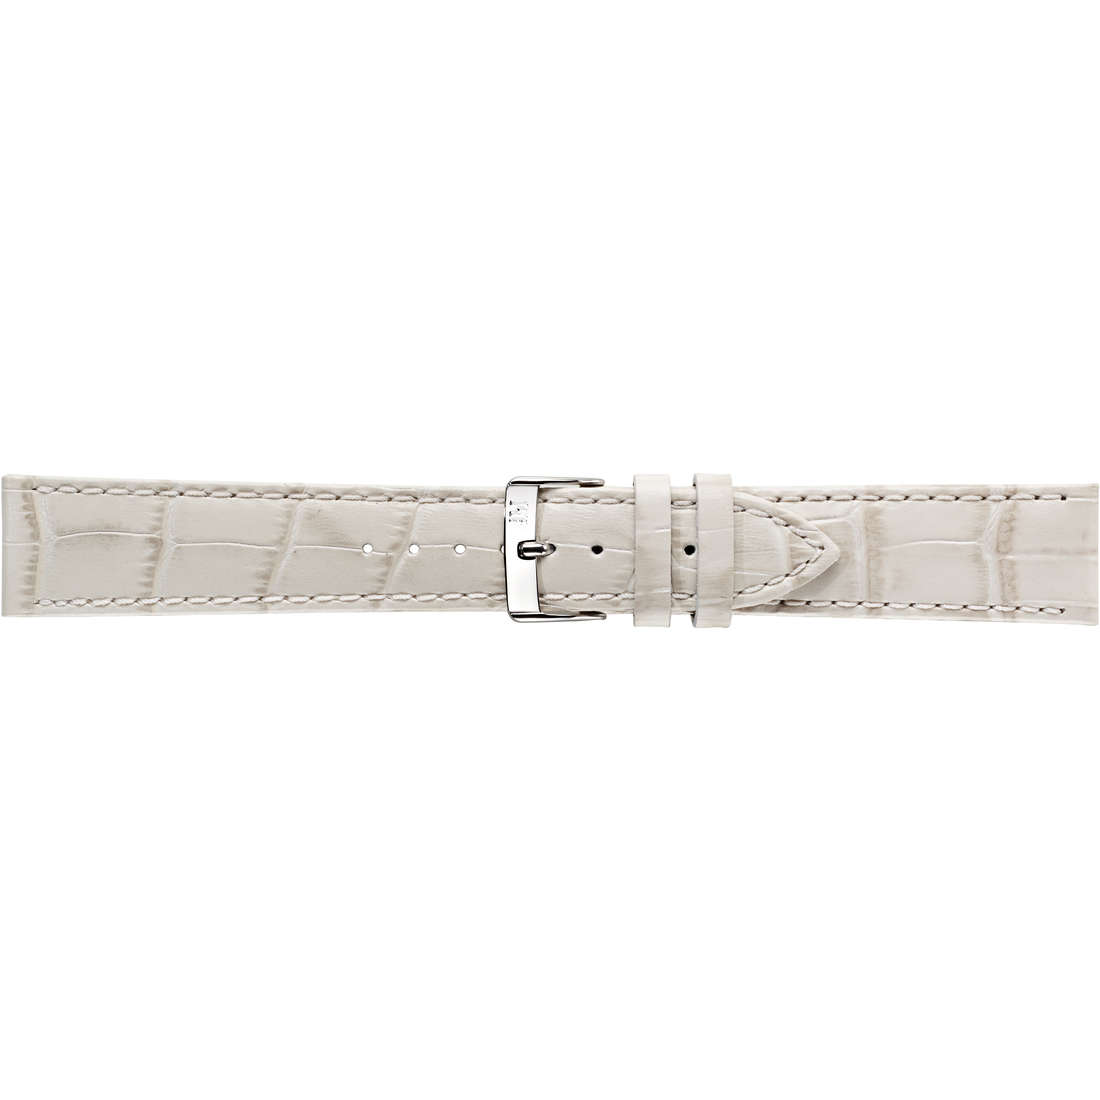 watch watch bands watch straps man Morellato Morellato 1930 A01X2269480026CR18